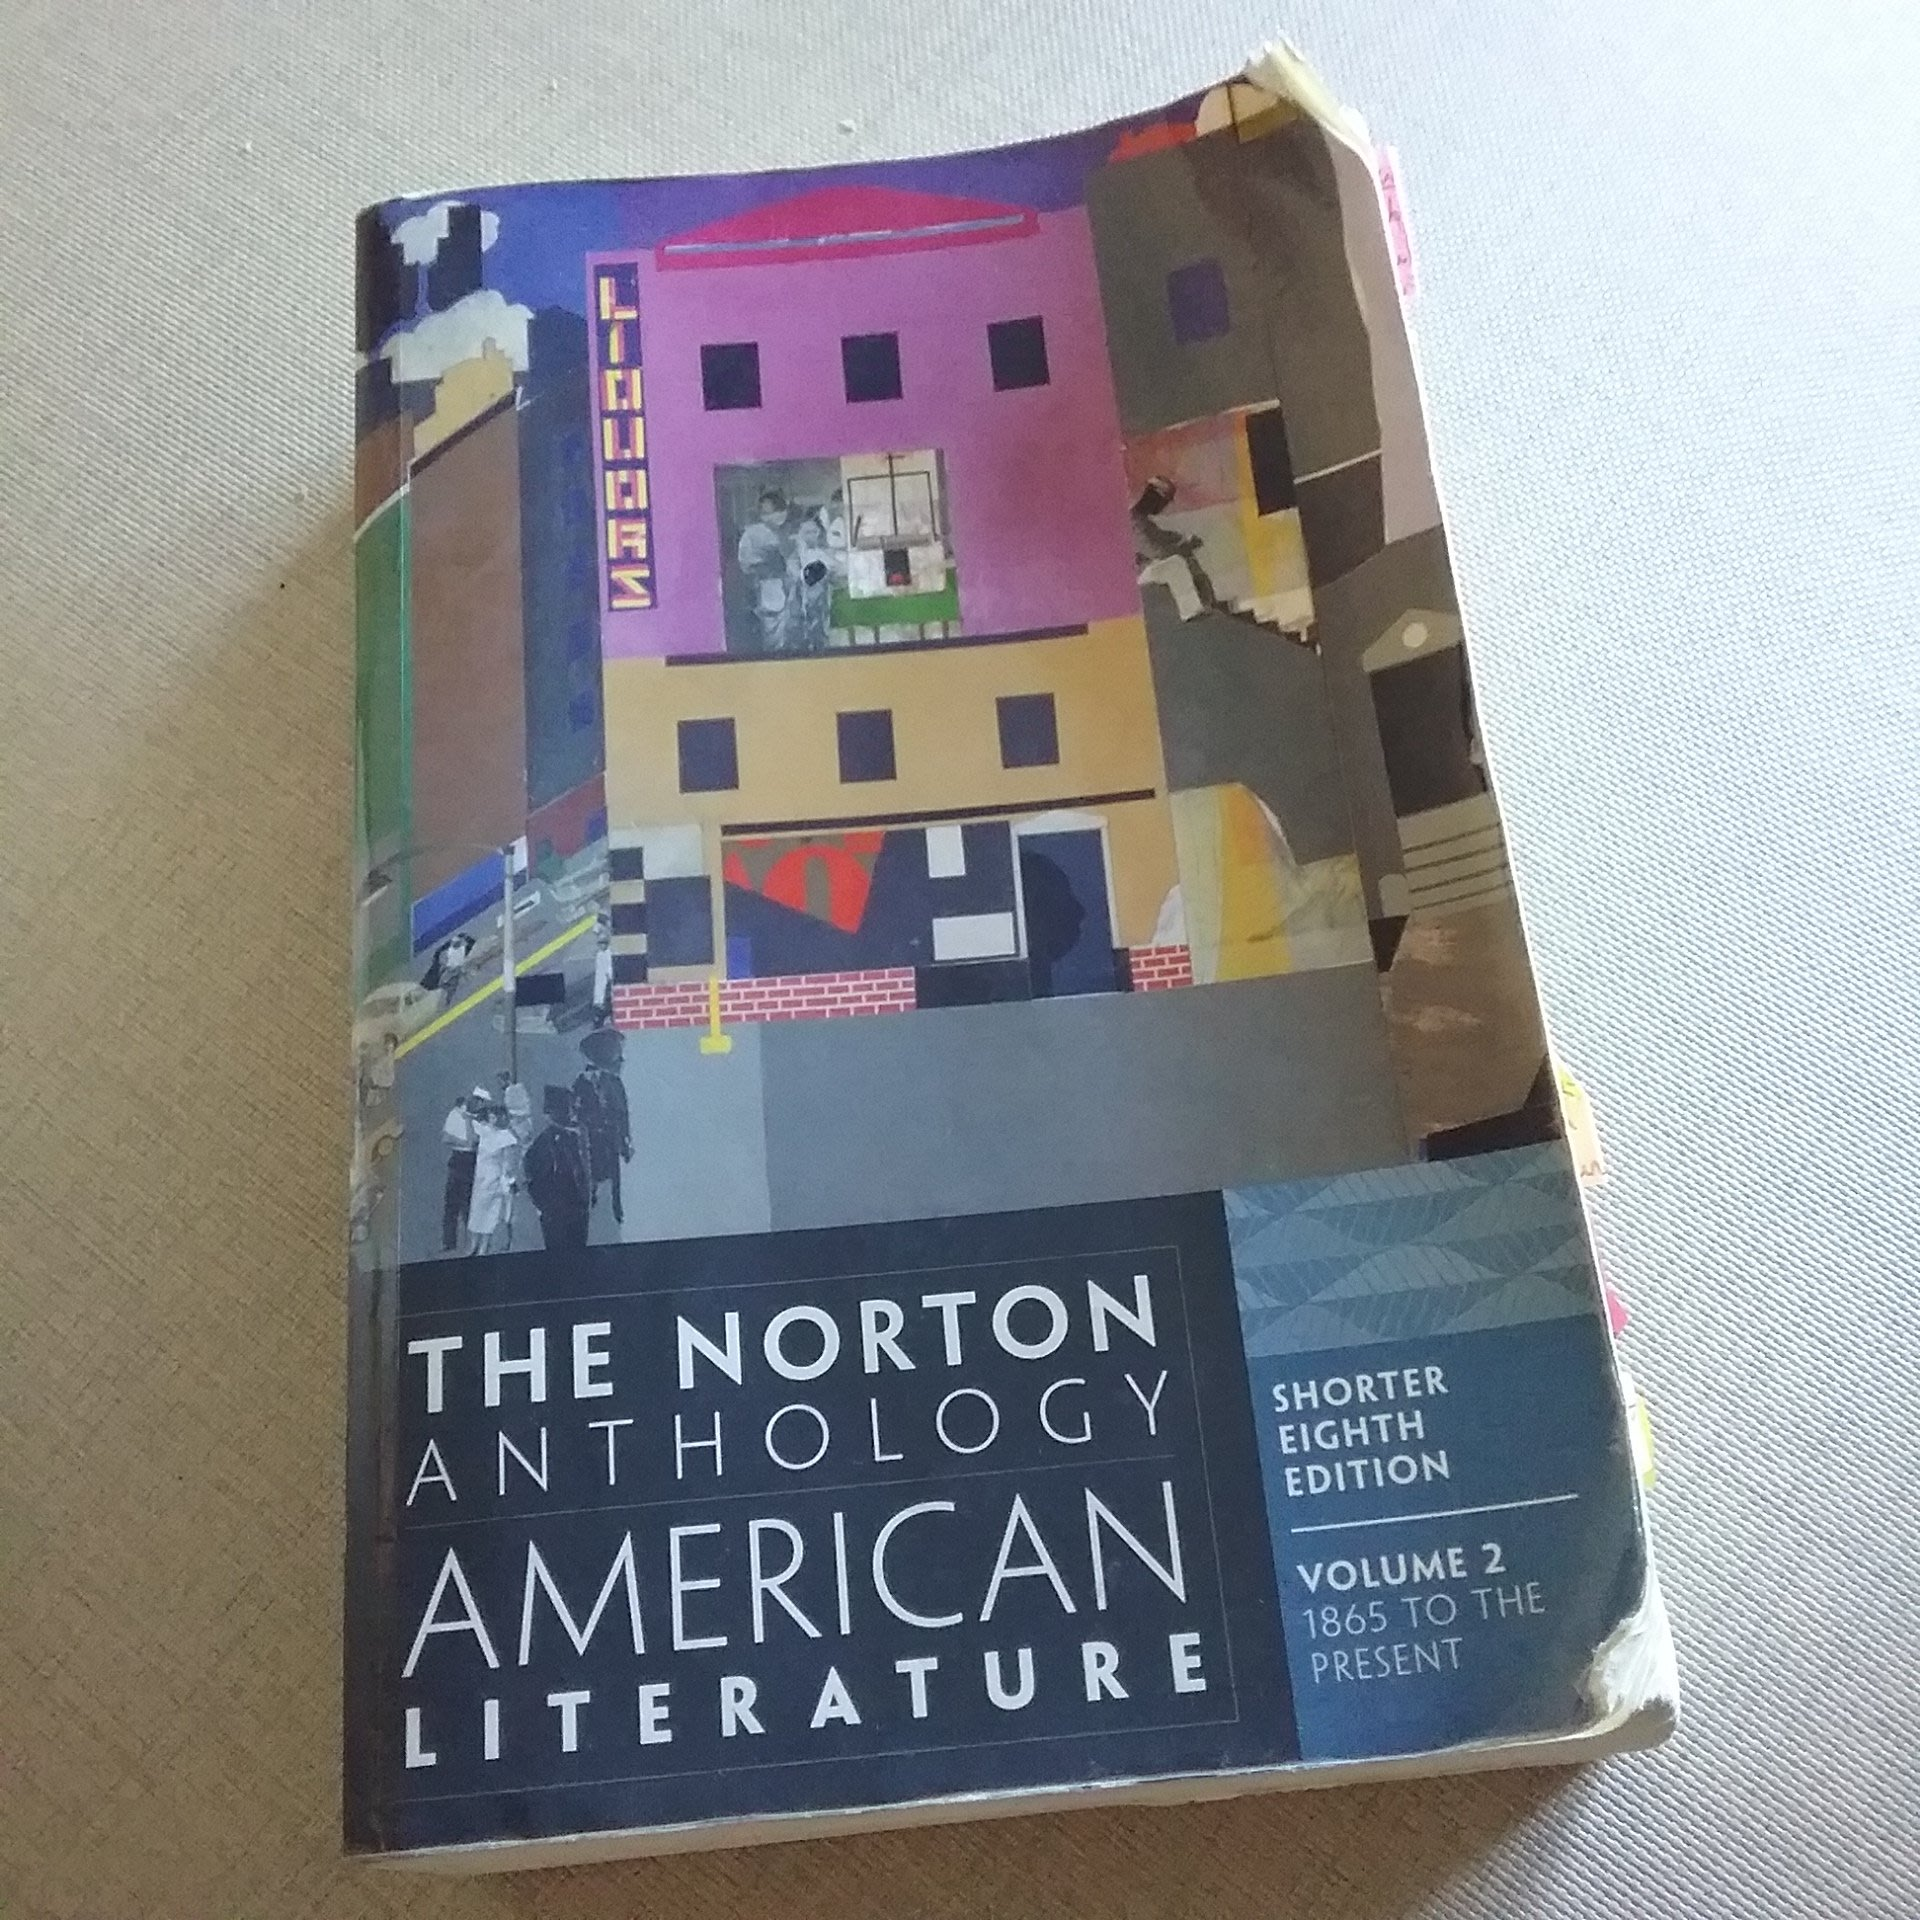 American literature 美國文學大學書籍原文書籍